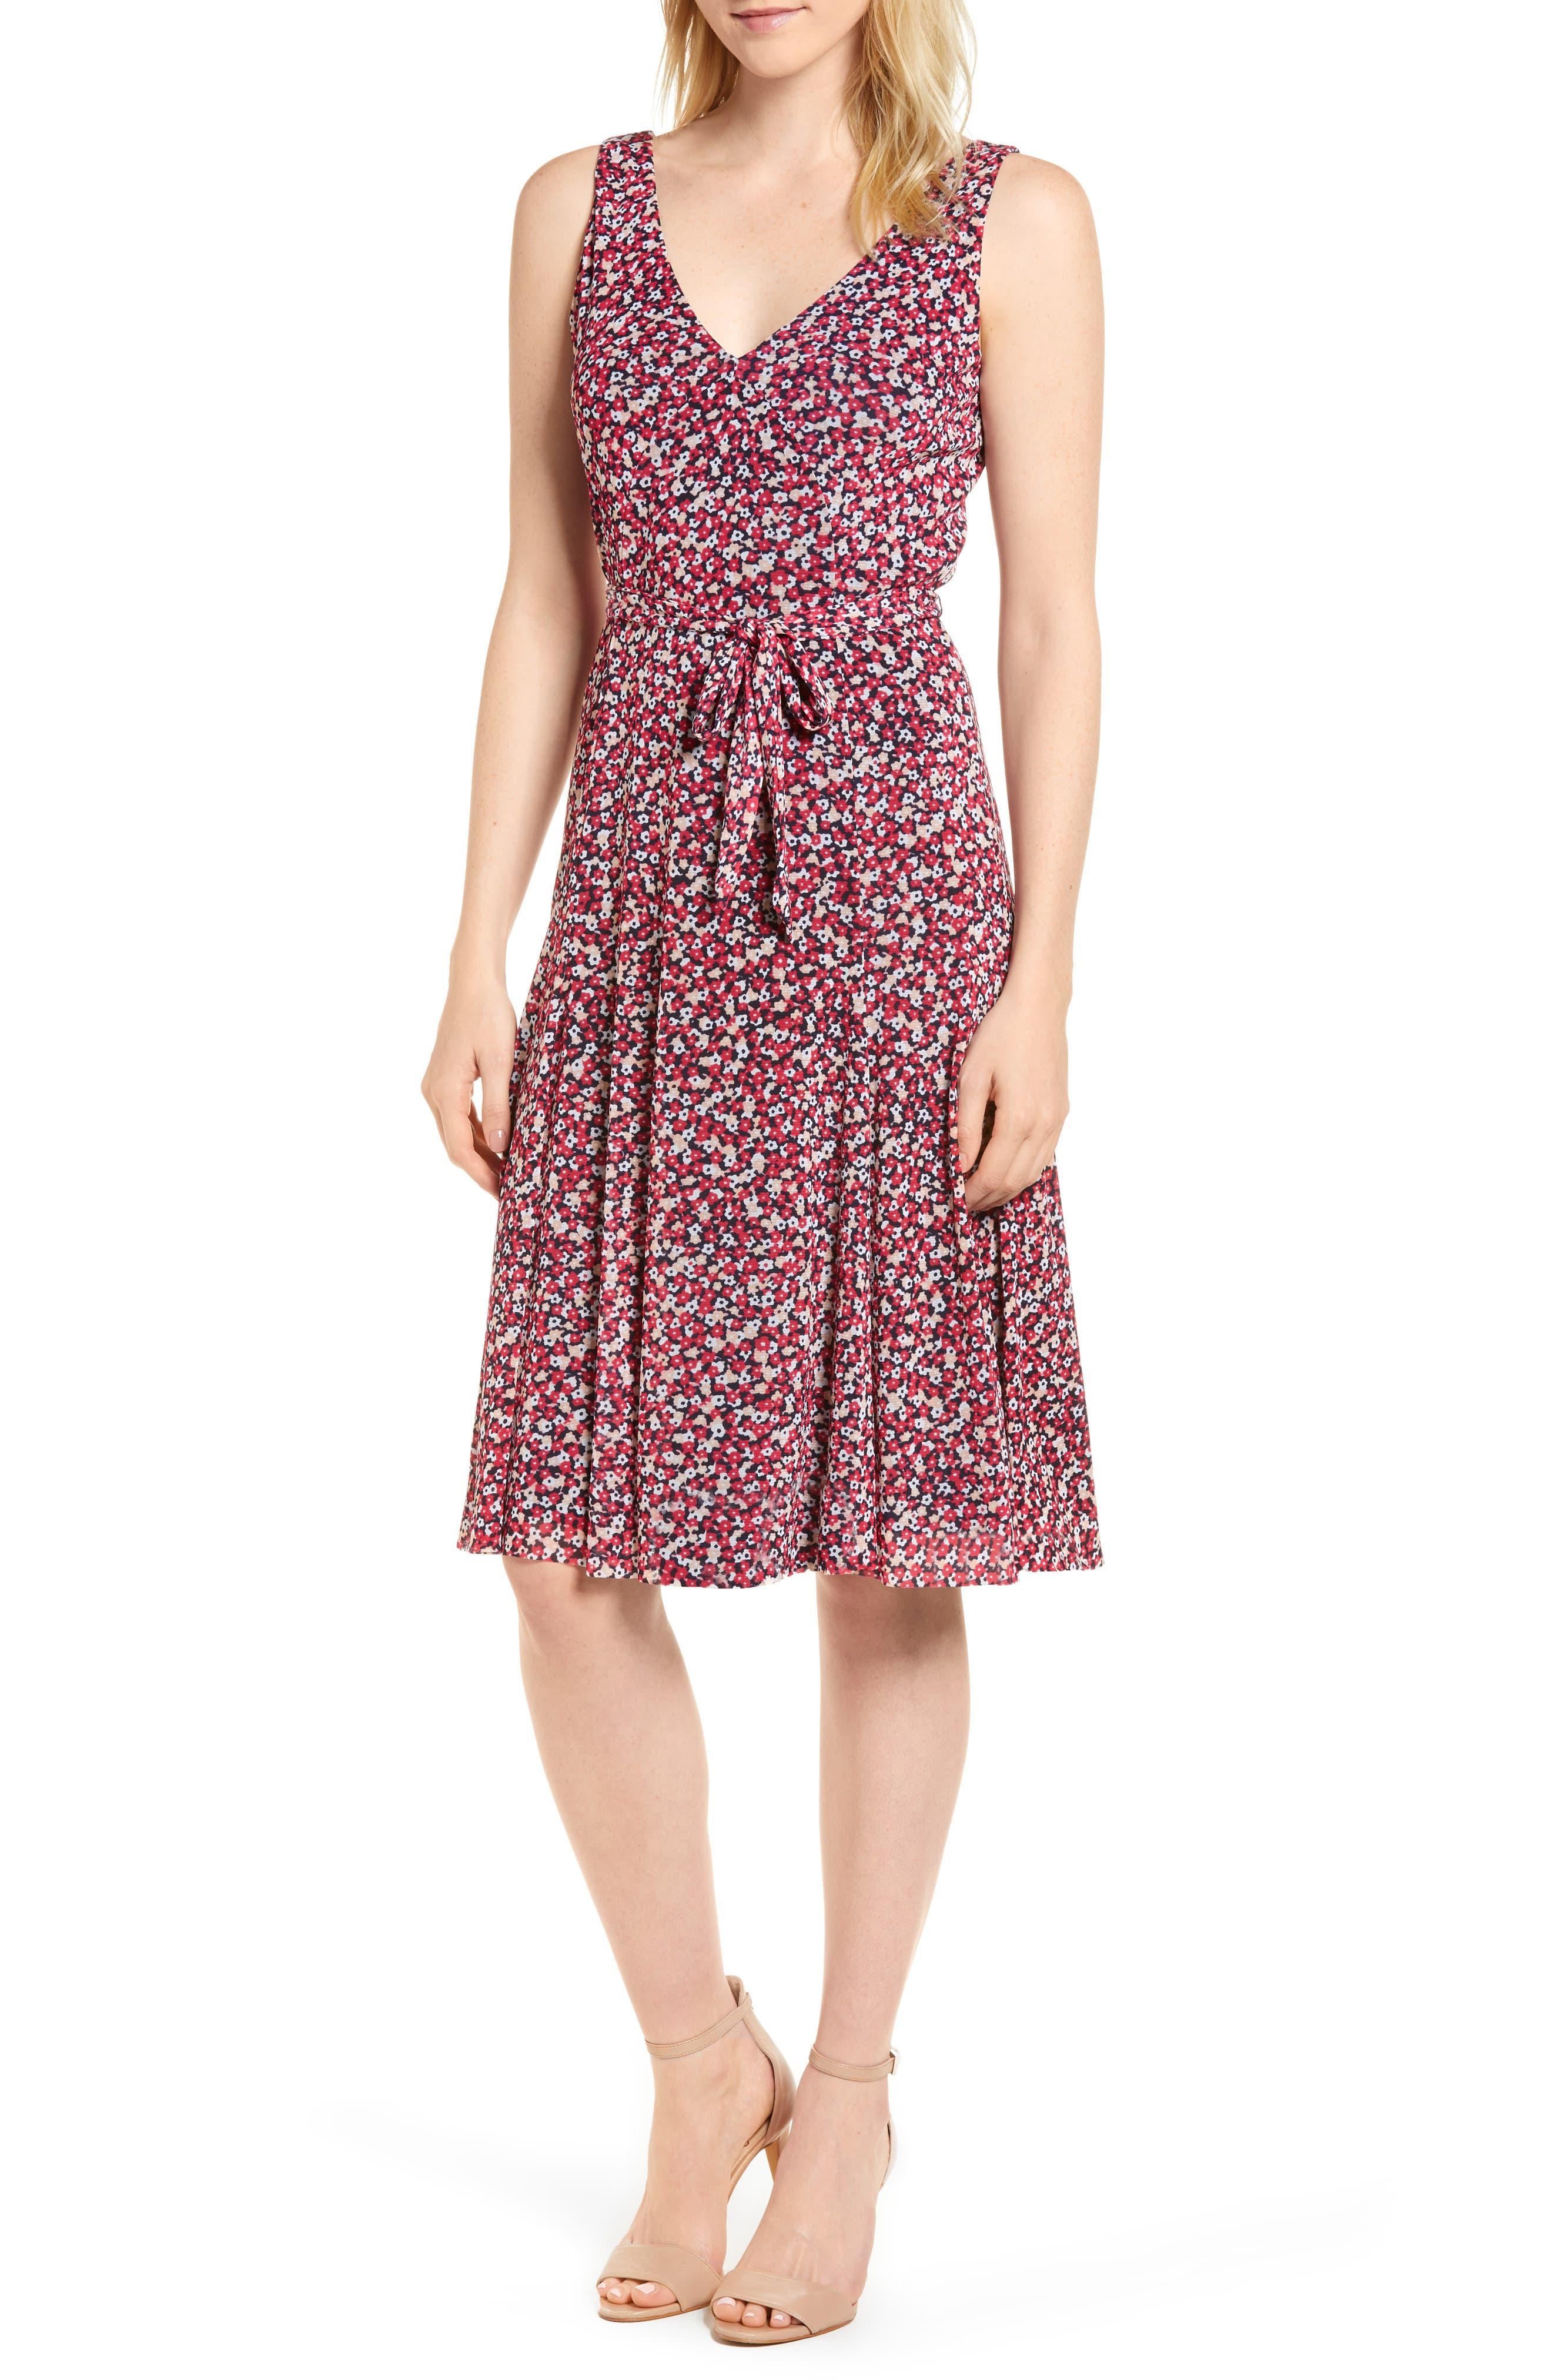 Floral Tank Dress,                             Main thumbnail 1, color,                             678